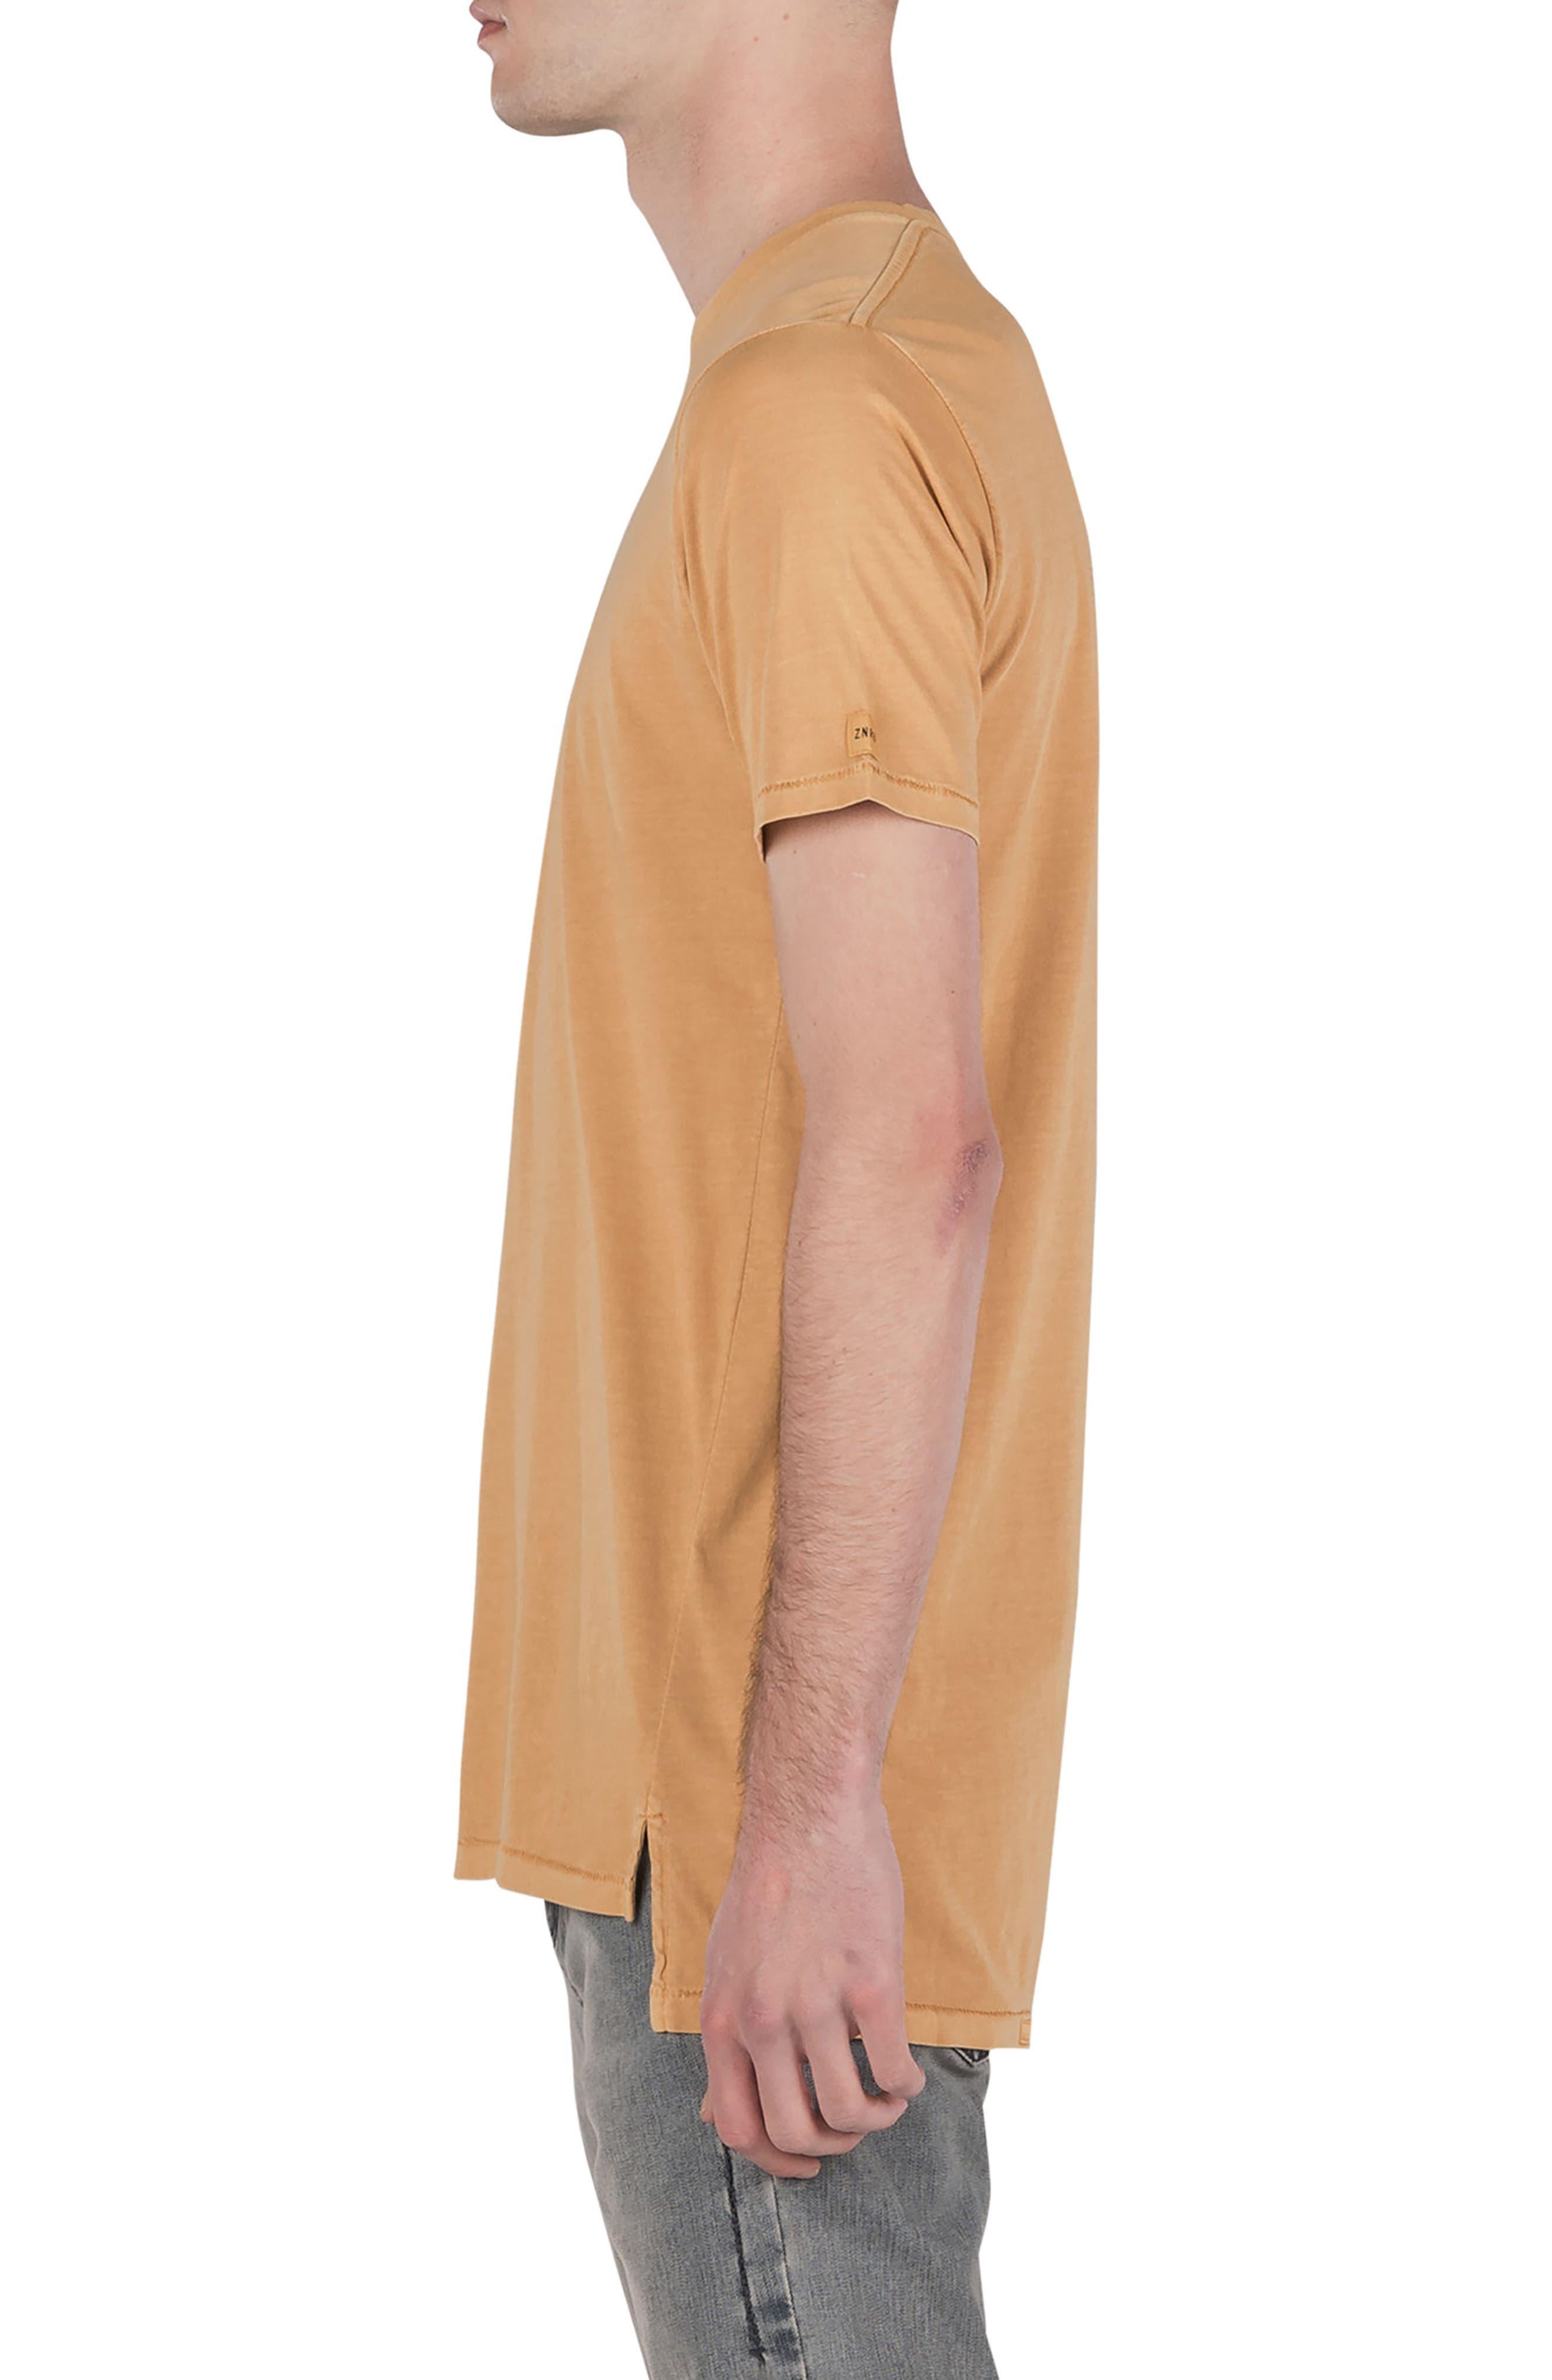 Flintlock T-Shirt,                             Alternate thumbnail 3, color,                             Saffron